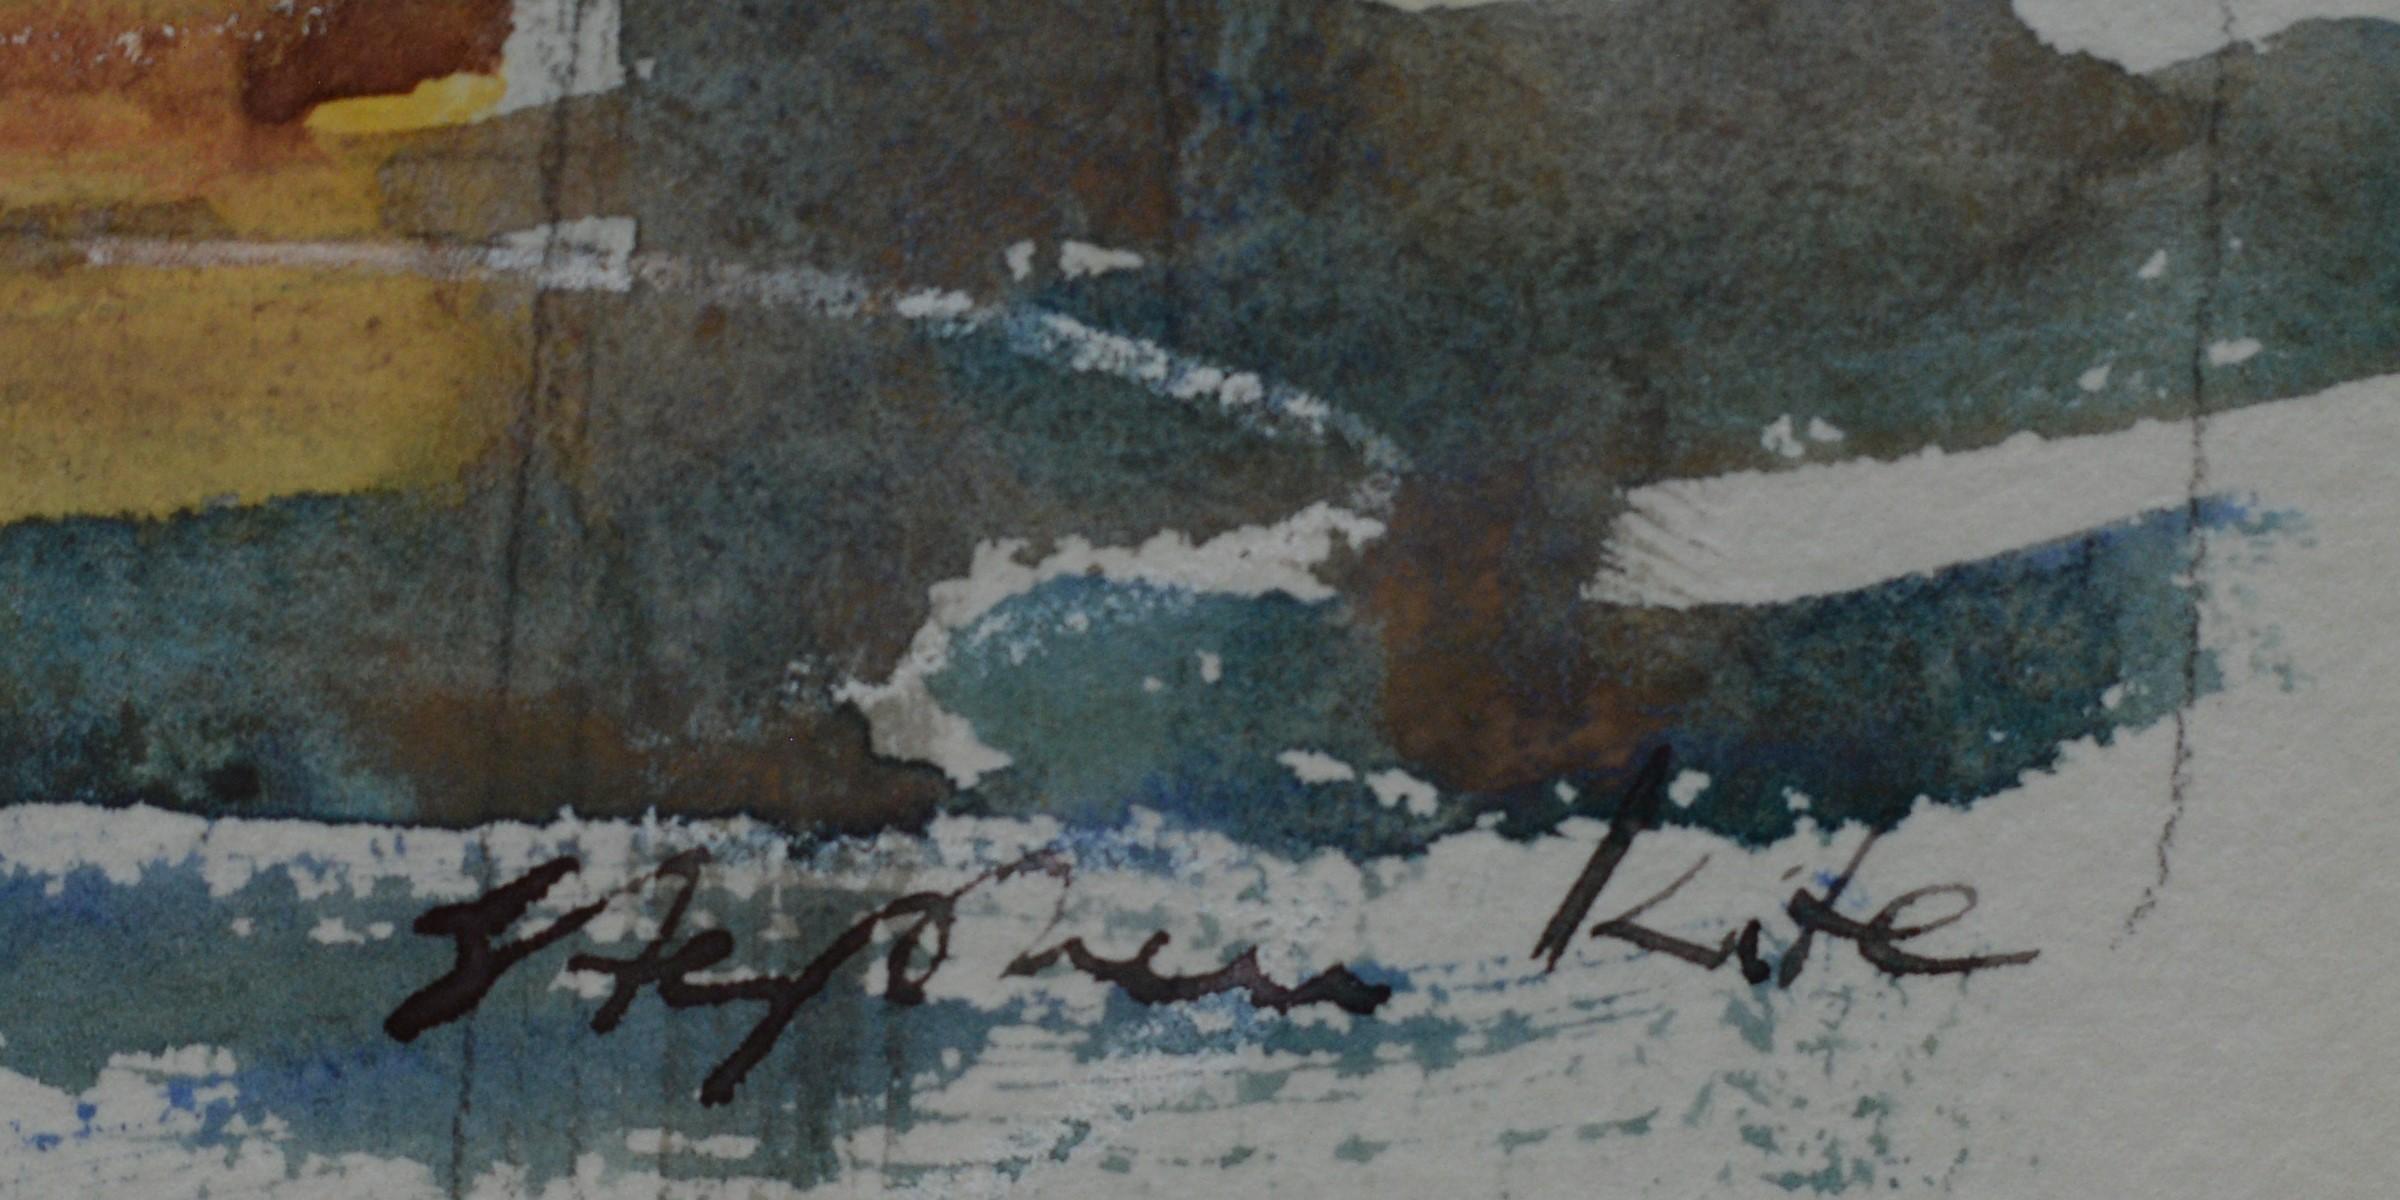 Stephen Kite - watercolour. - Image 2 of 3